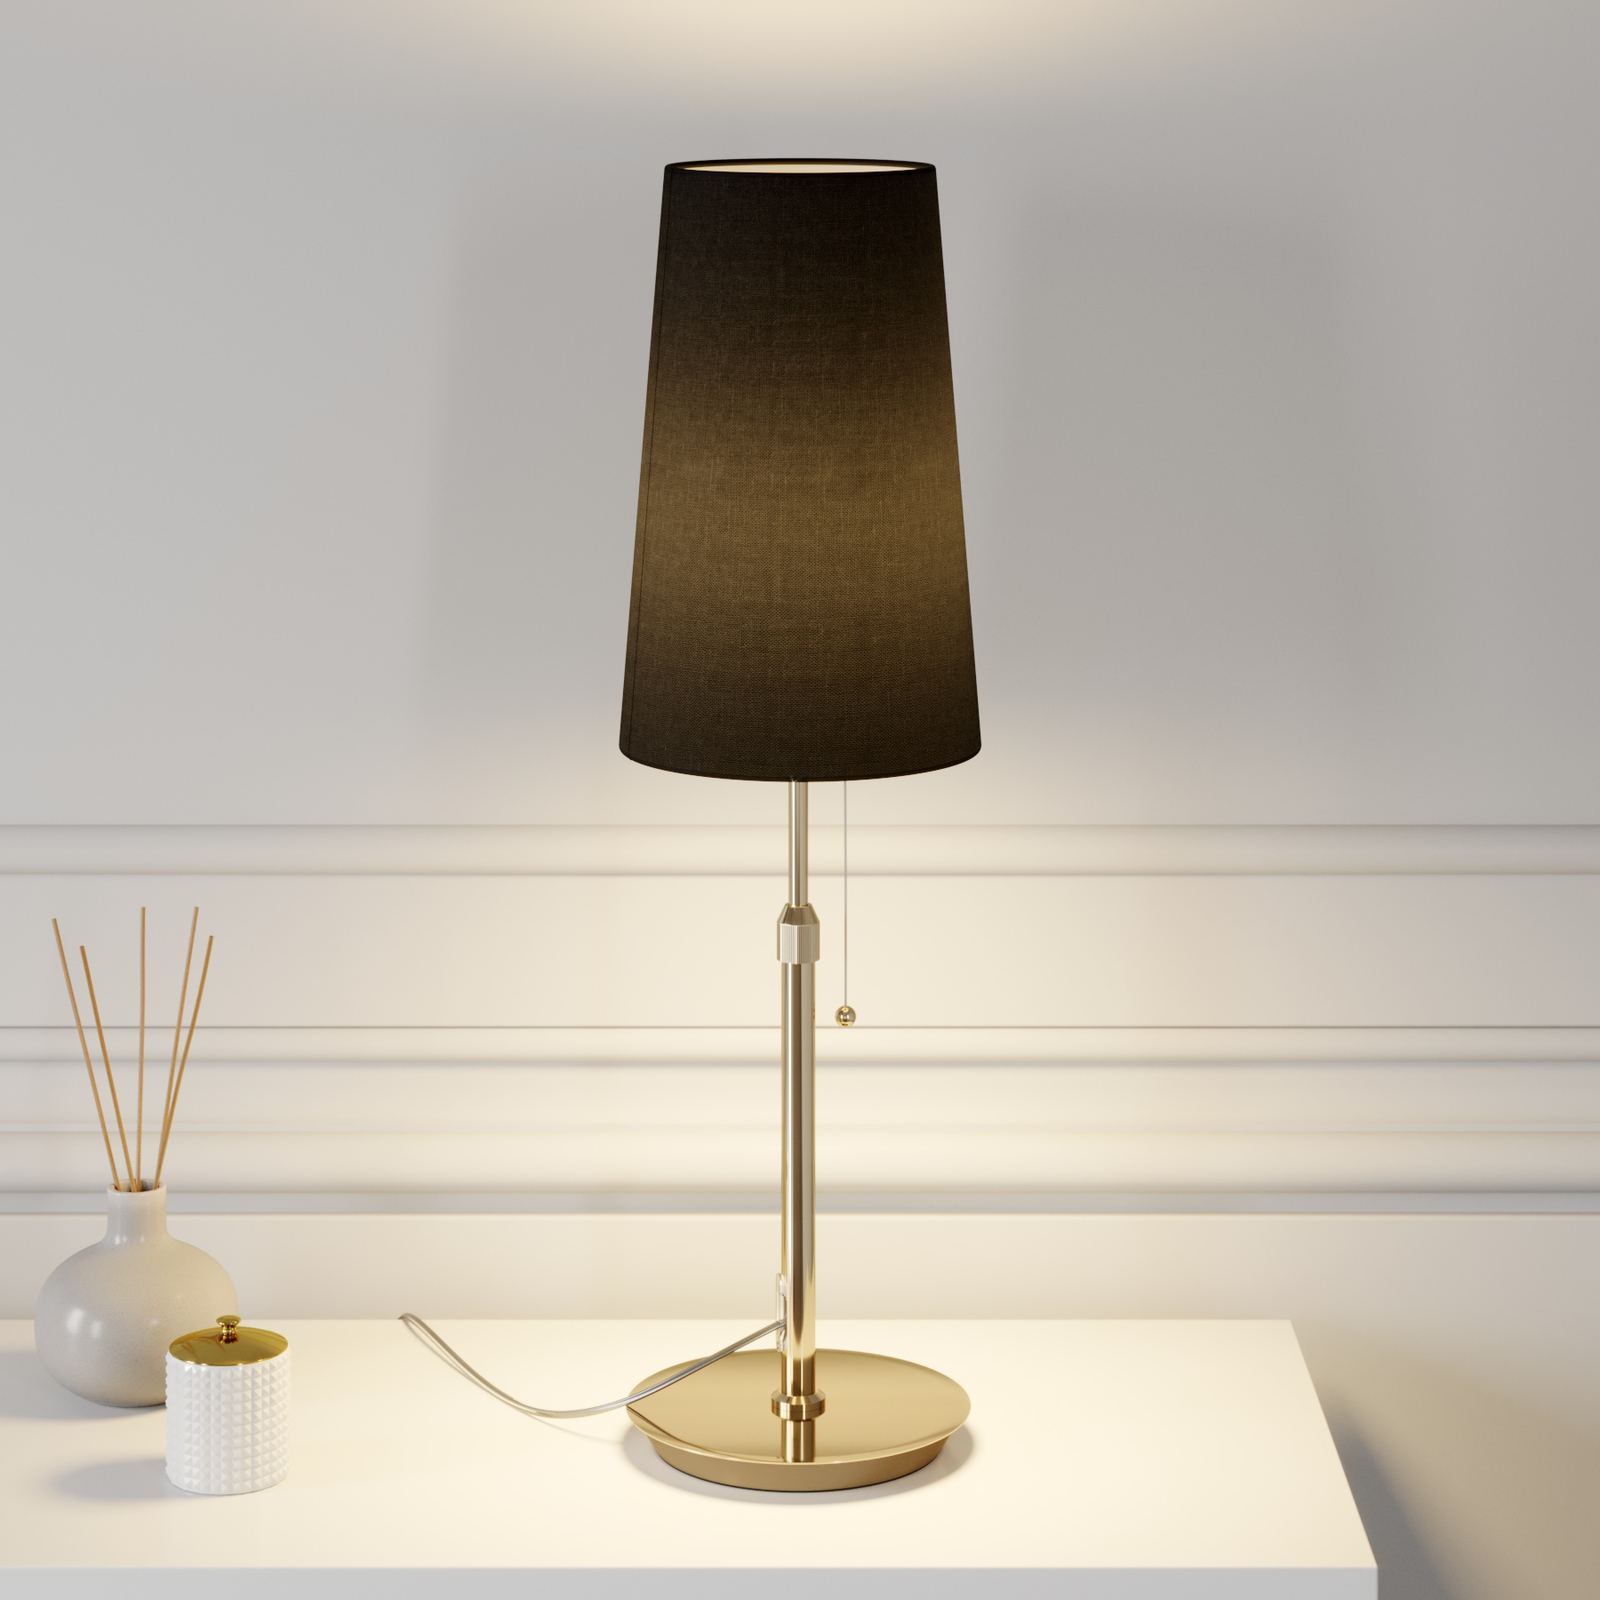 Lucande Pordis bordslampa, mässing-svart